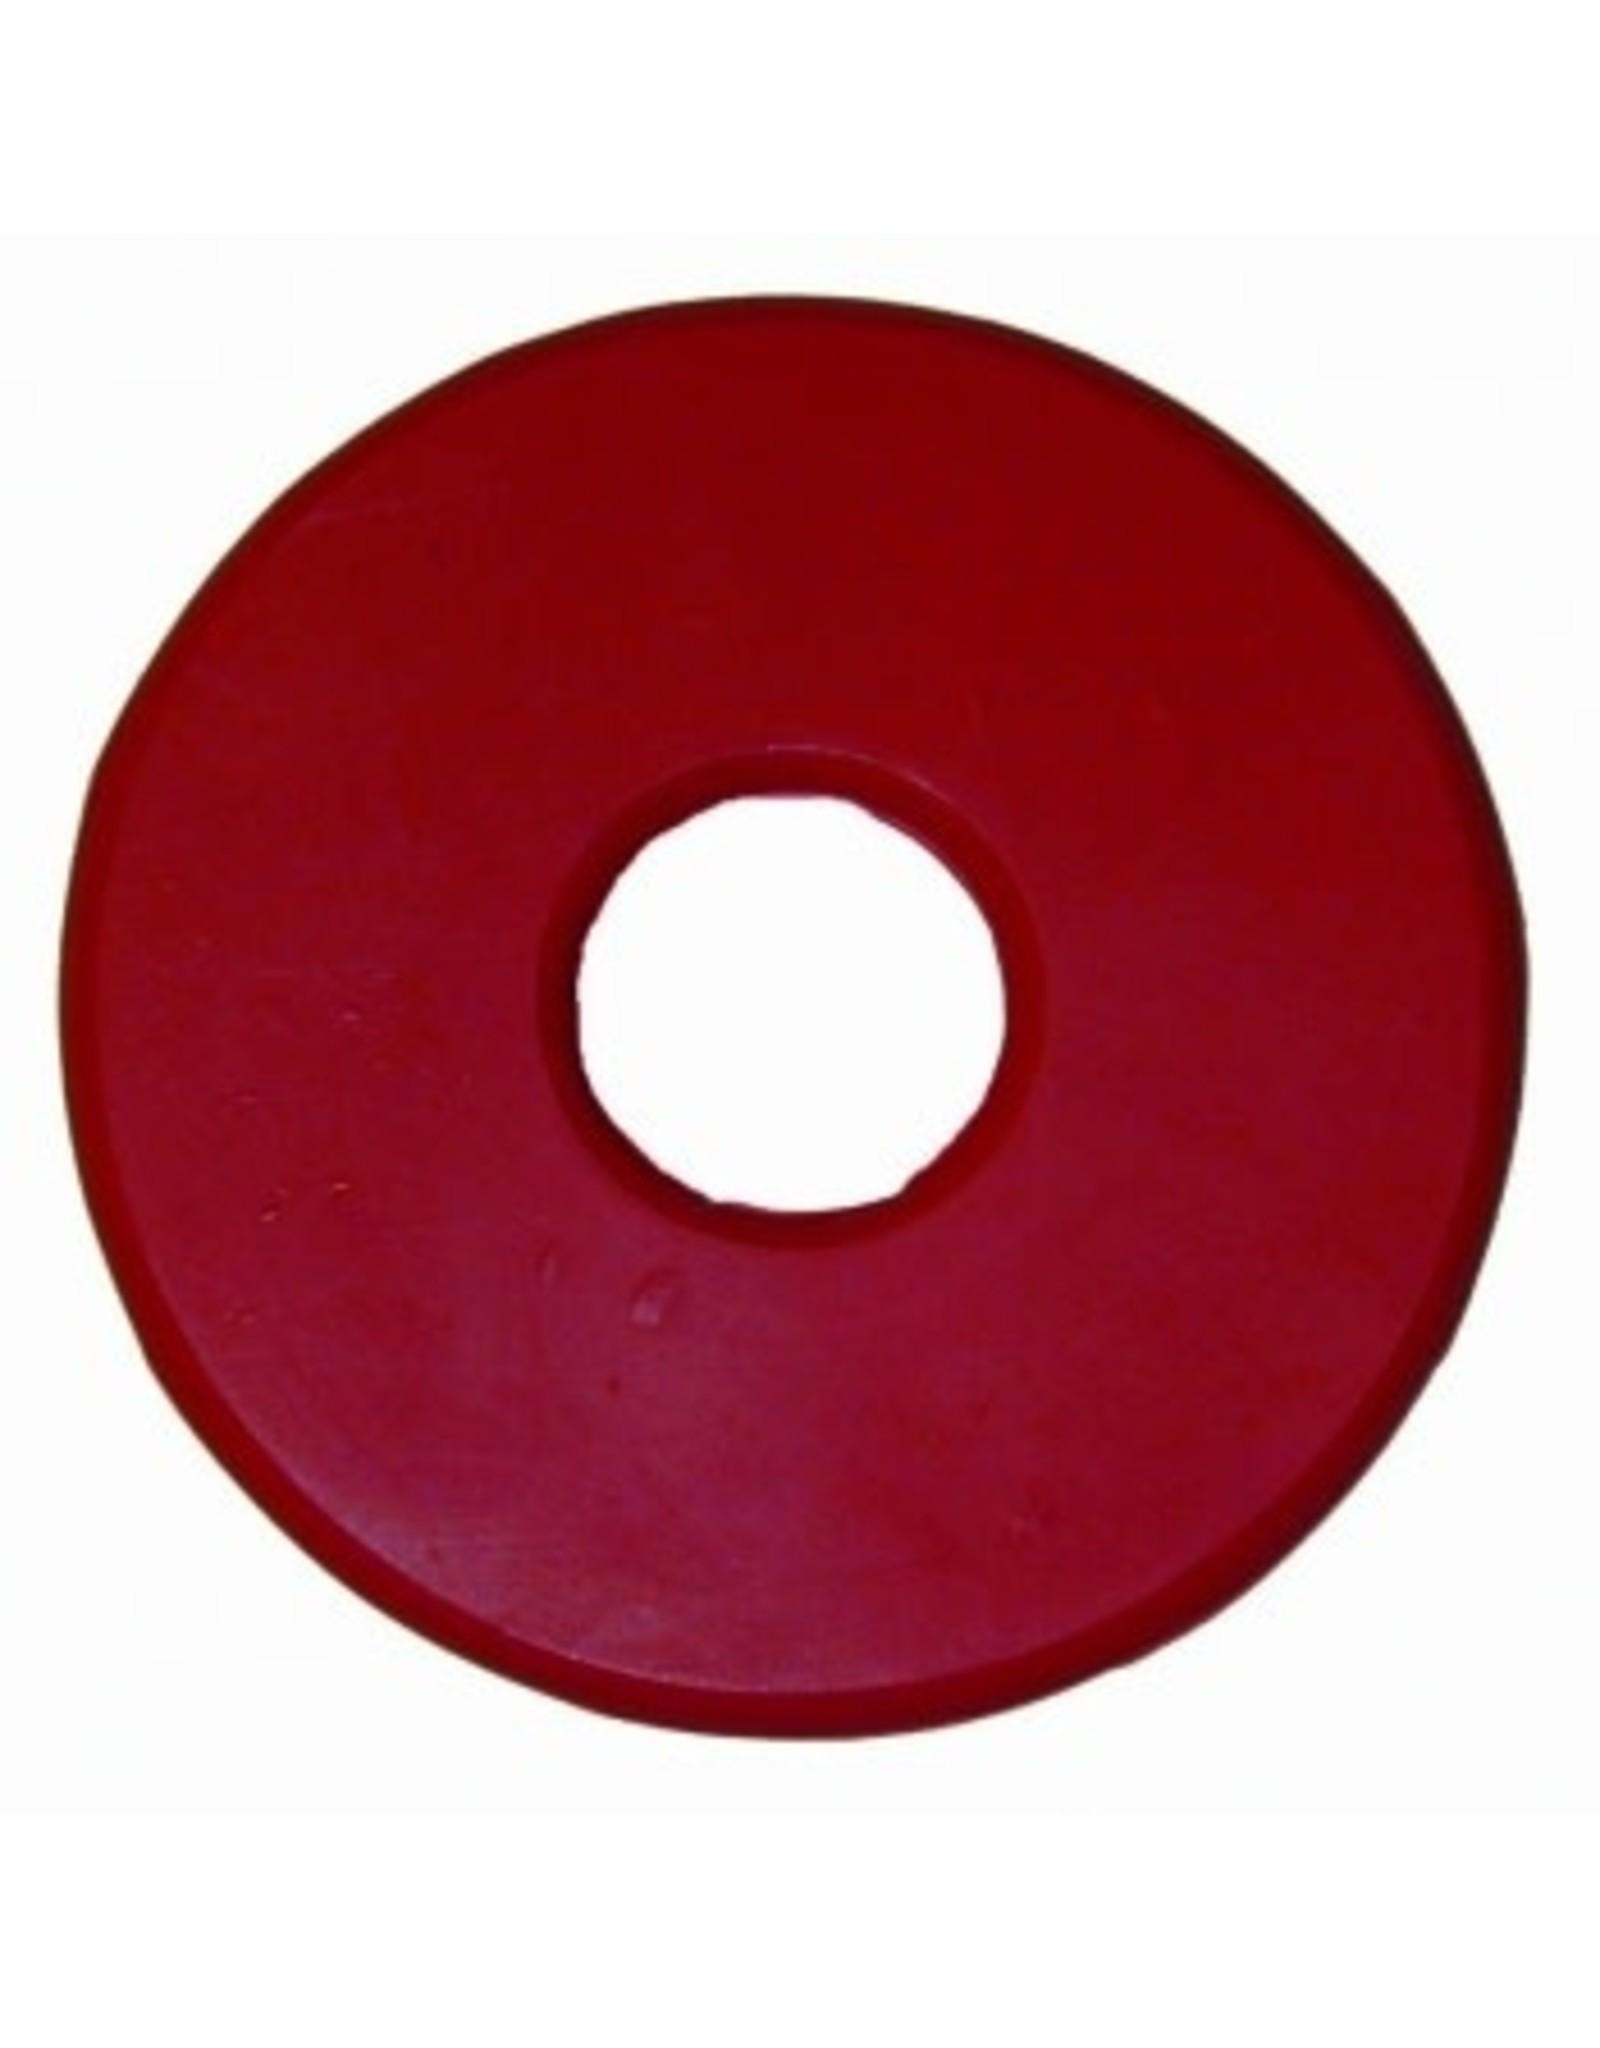 244190 Rubber Bit Guard